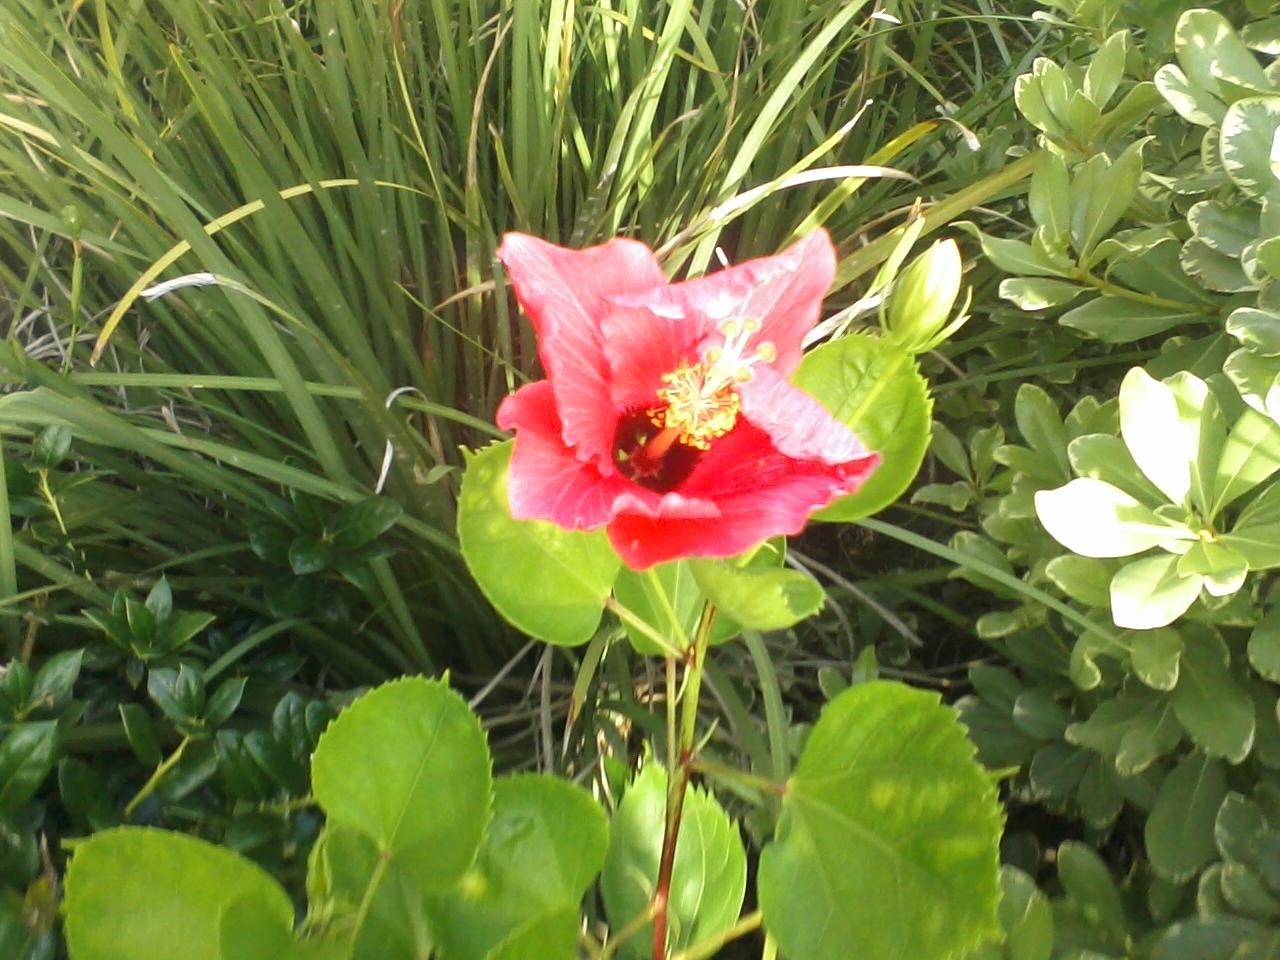 Gardening 2015 - 0629185520.jpg